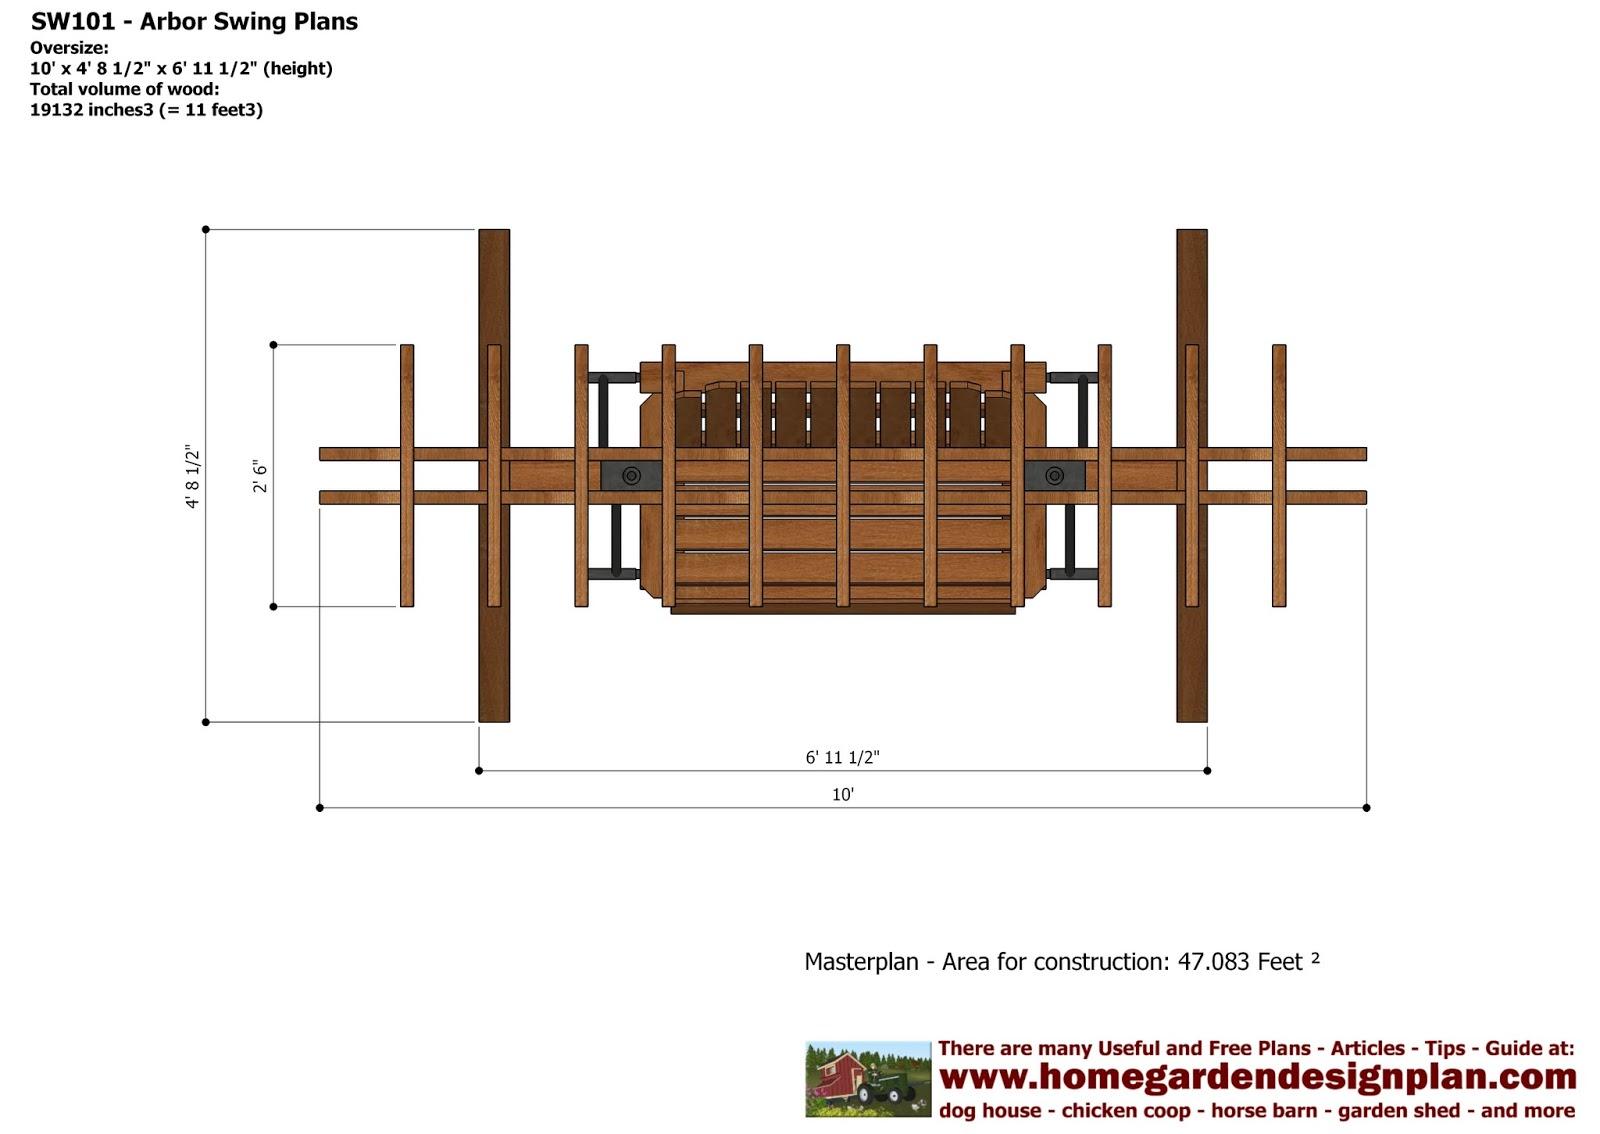 home garden plans SW101 Arbor Swing Plans Construction Graden